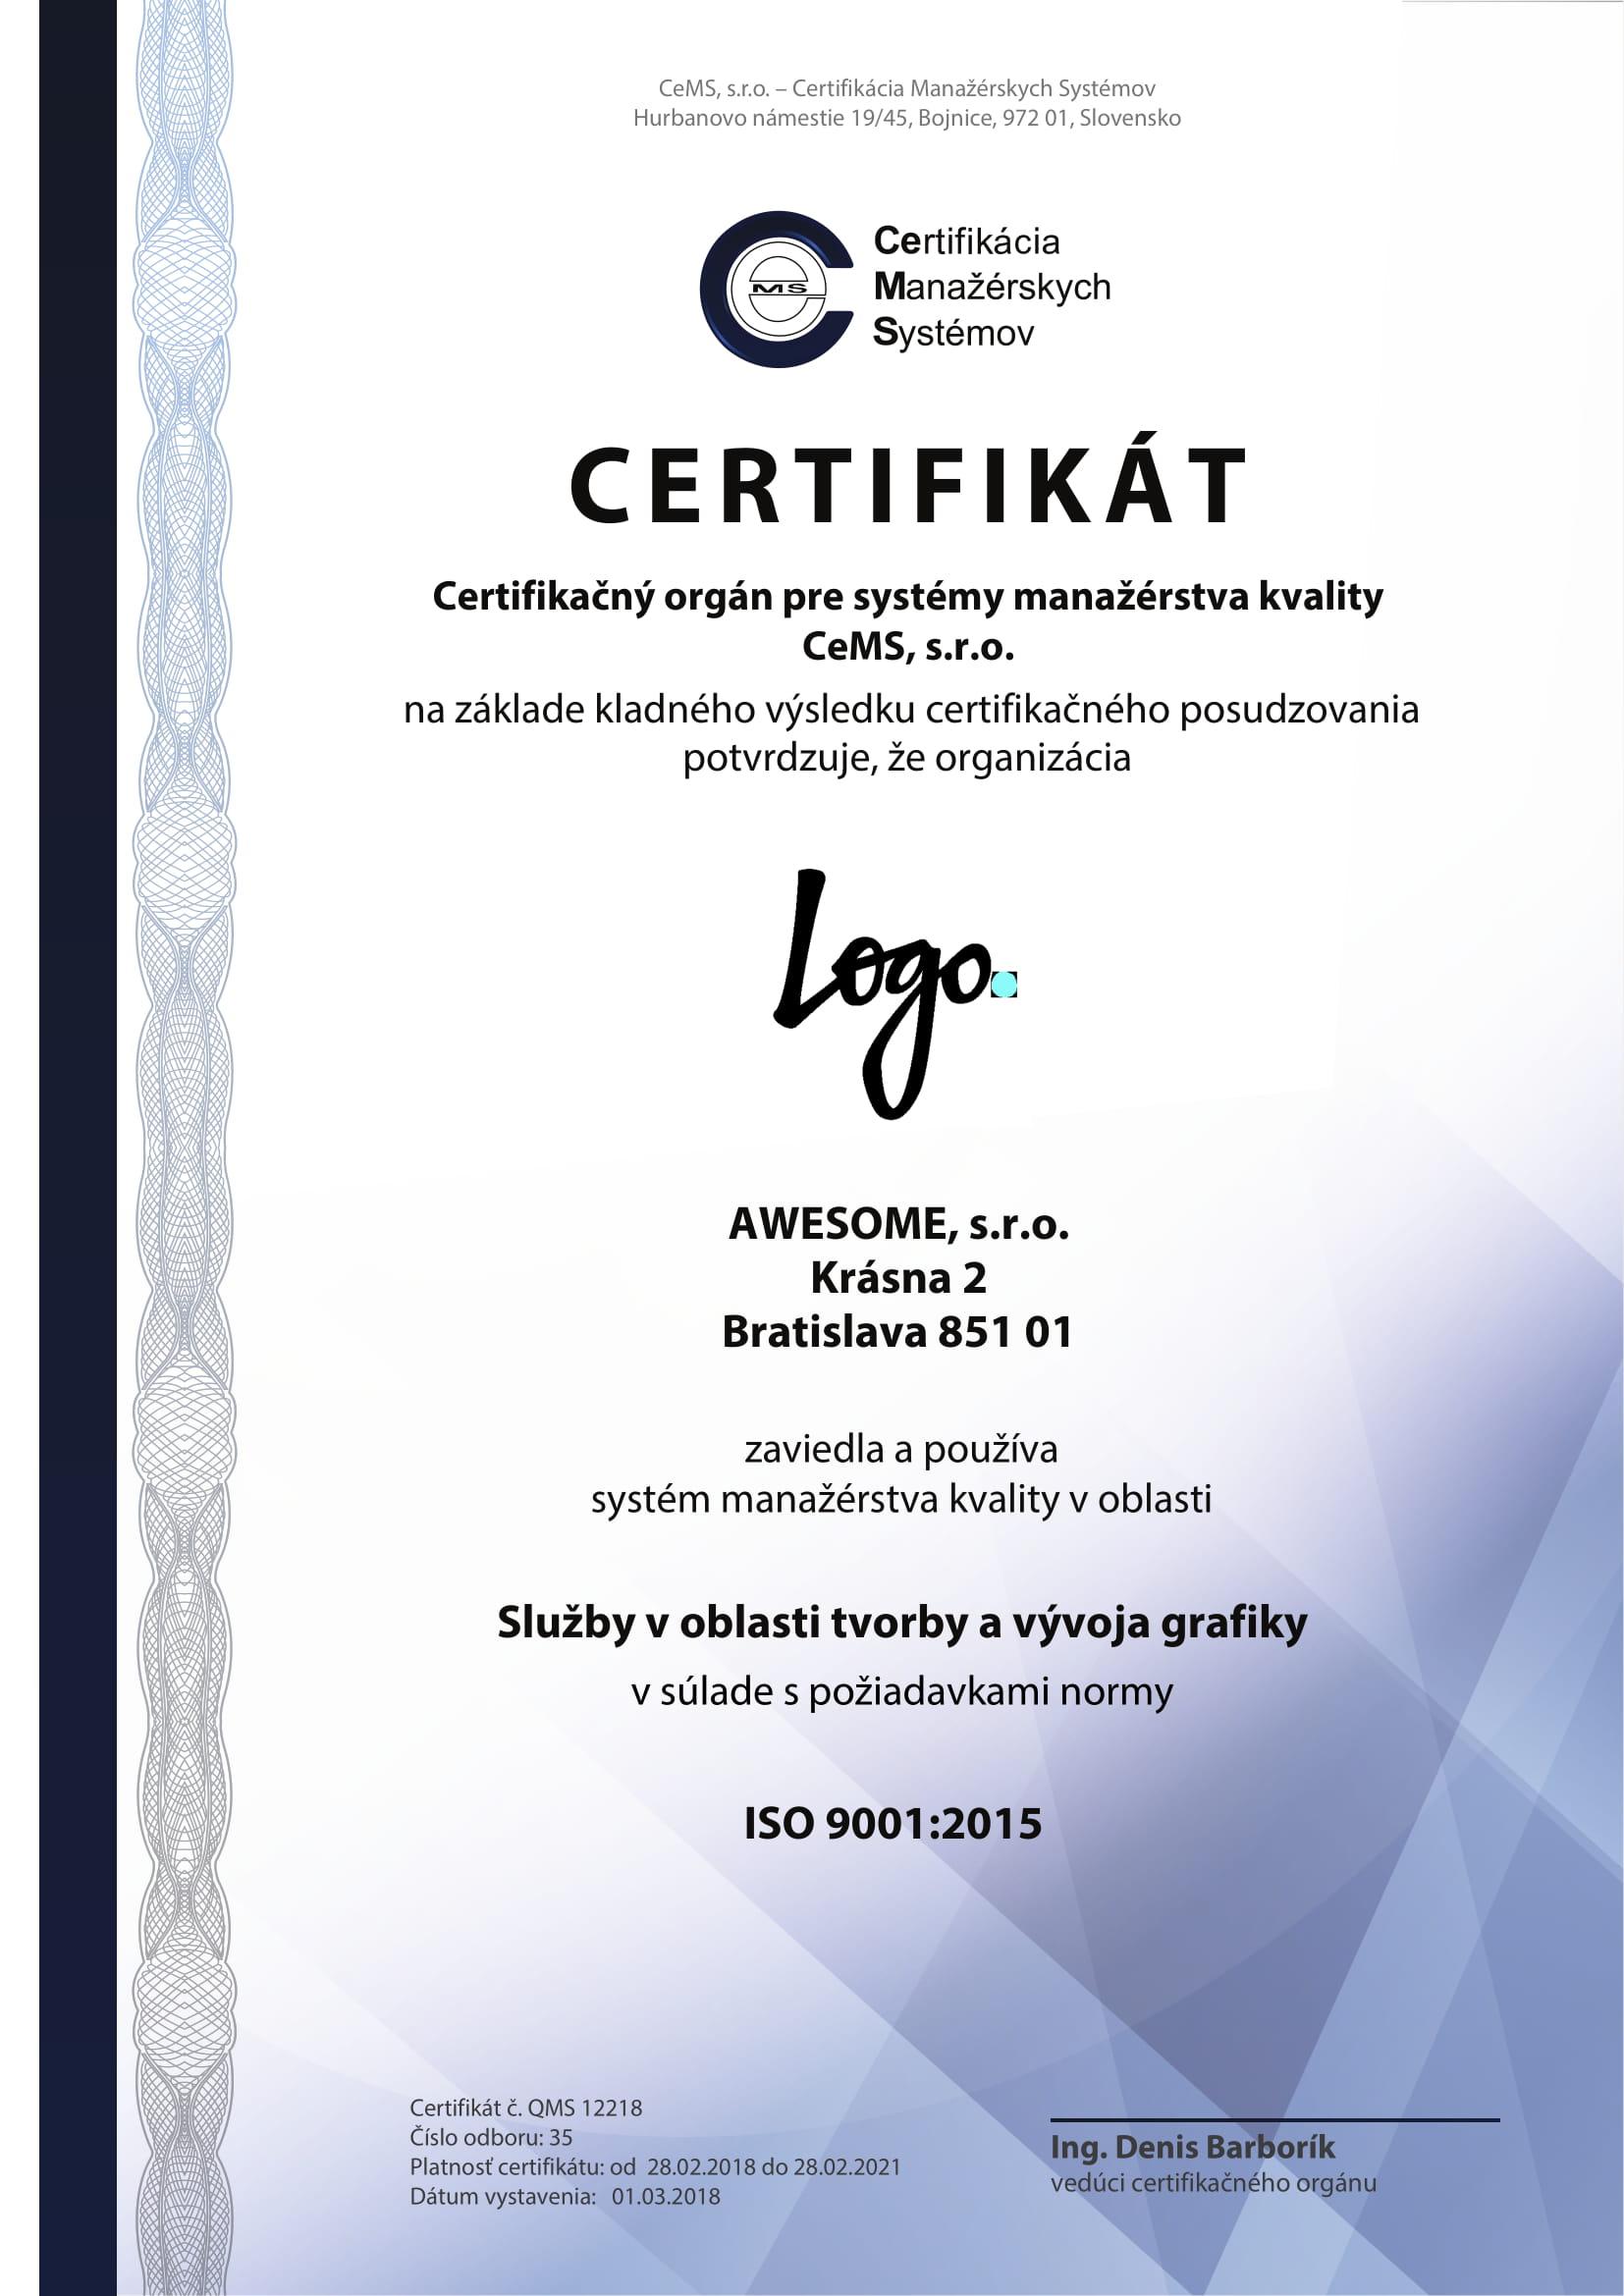 vzor certifikátu ISO 9001 od CeMS